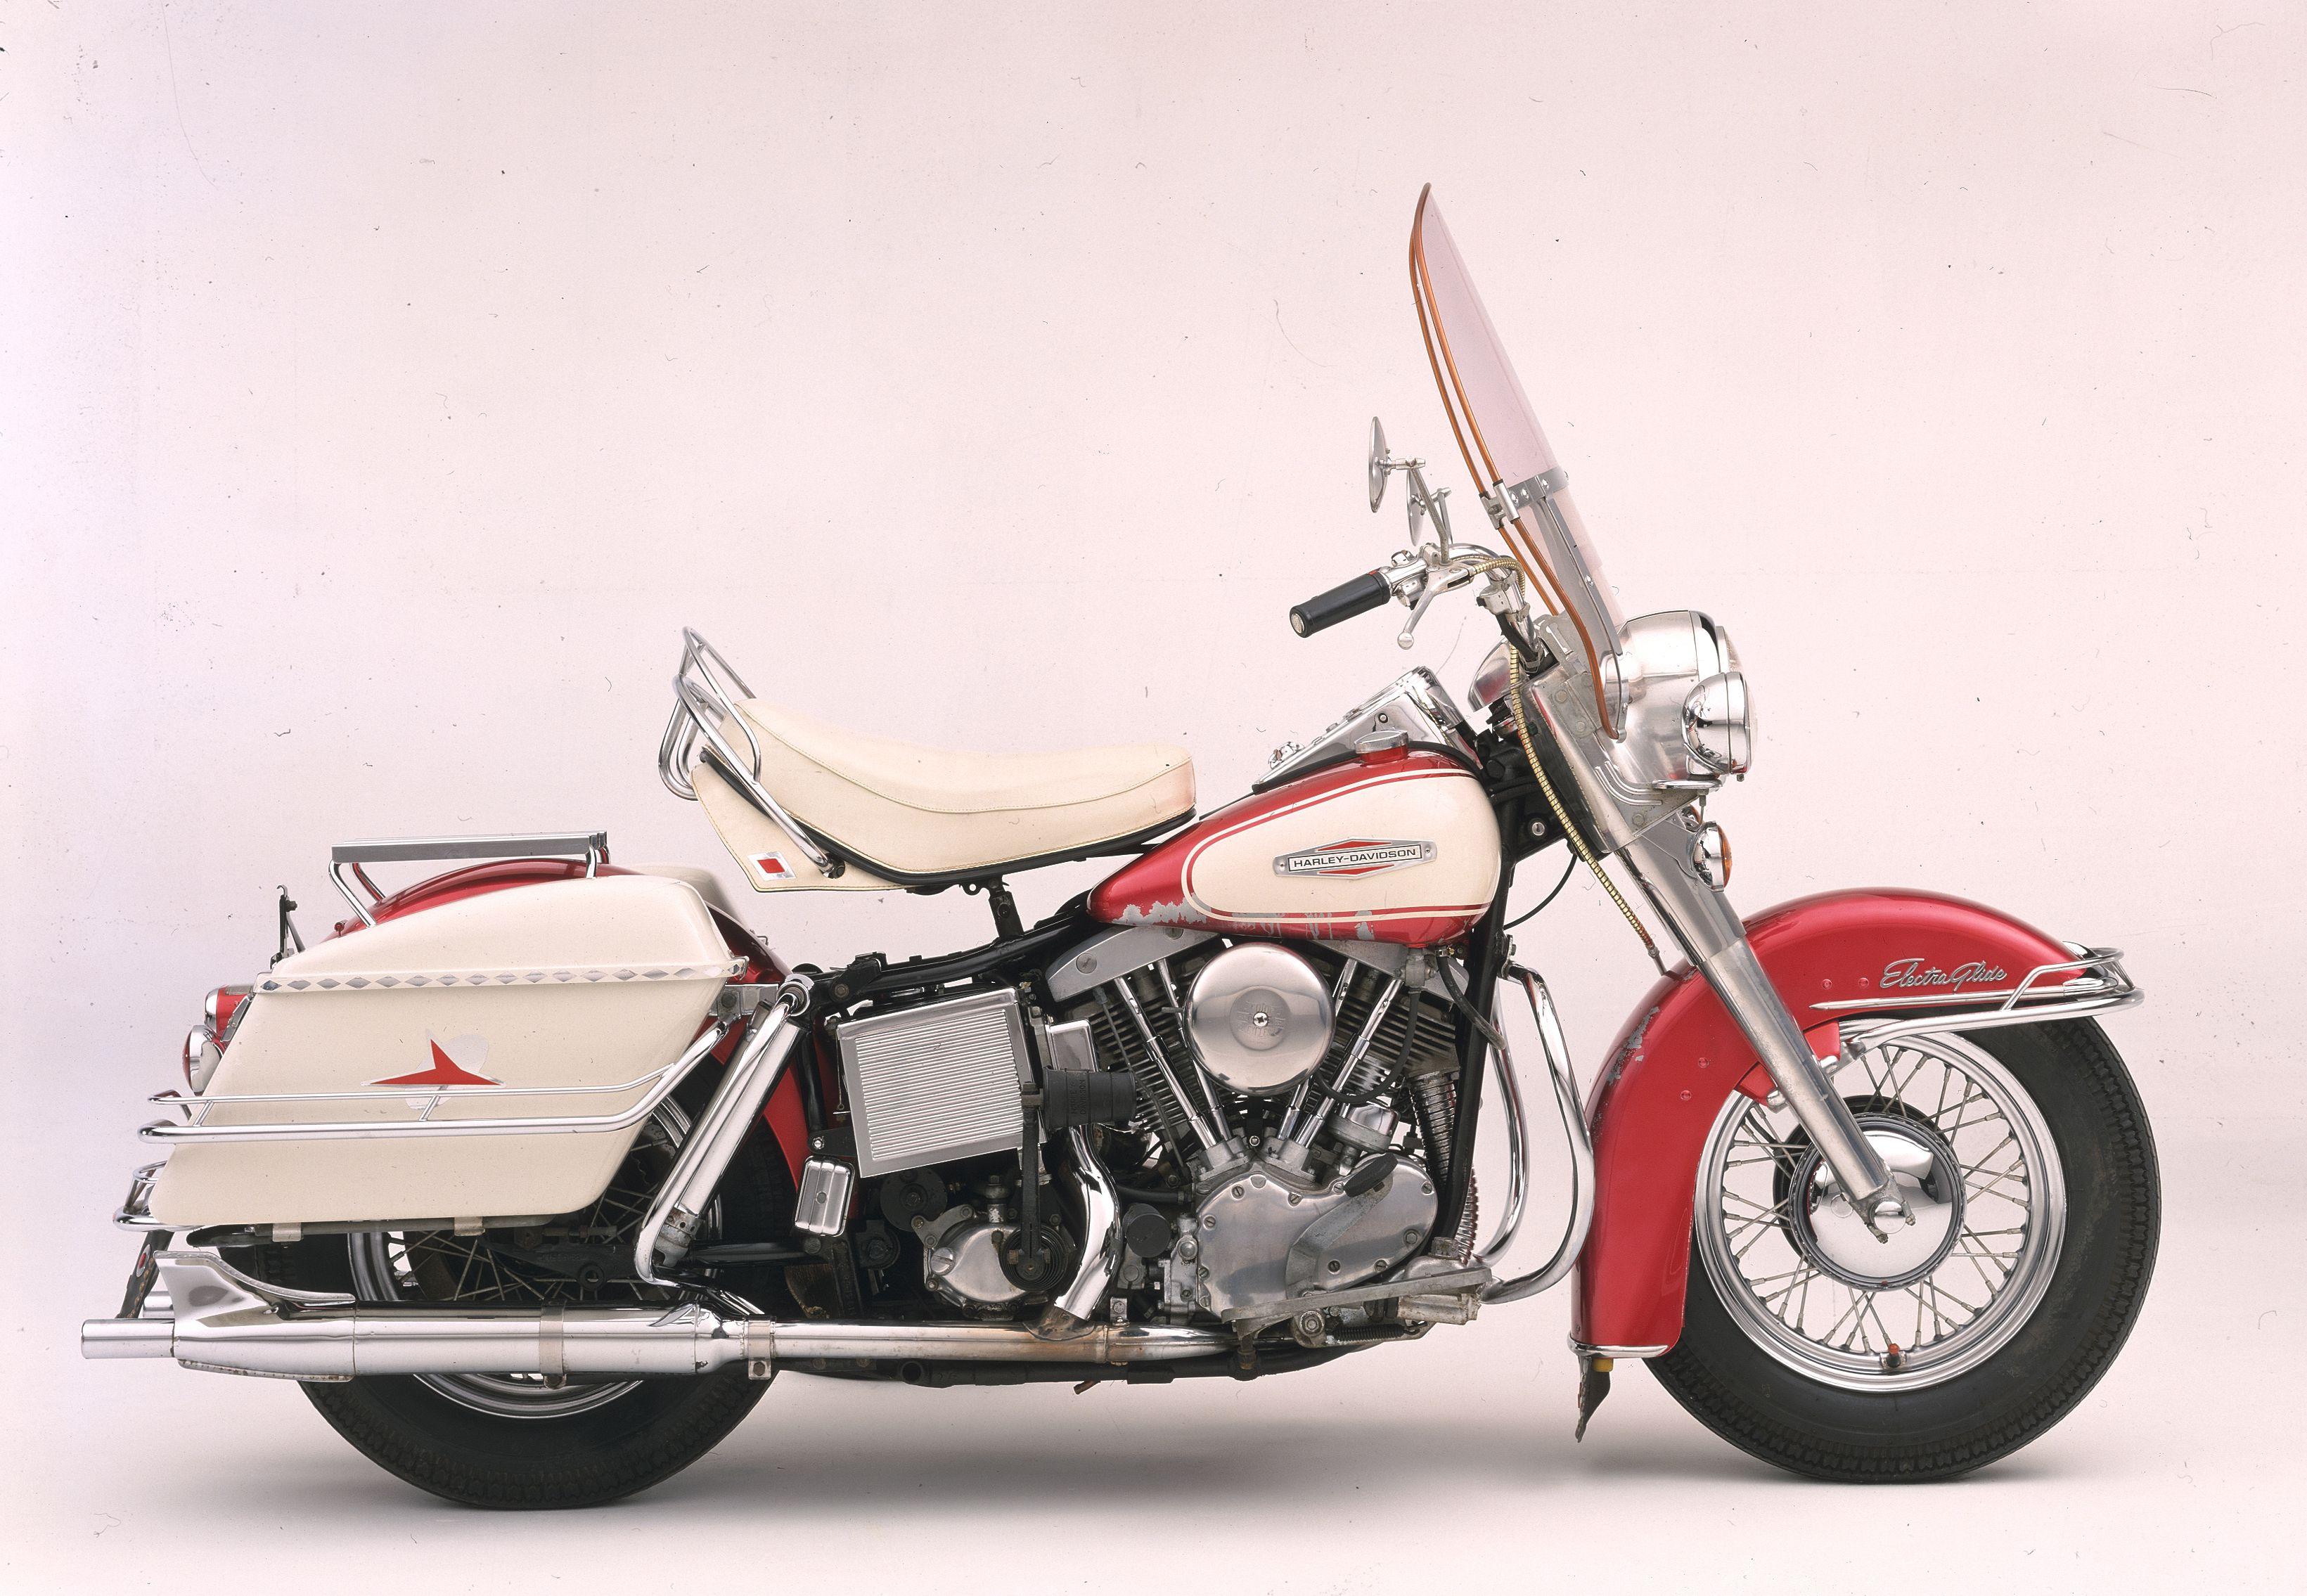 1979-1985 Primary To Transmission Gasket 4 Speed Harley Shovelhead Big Twin